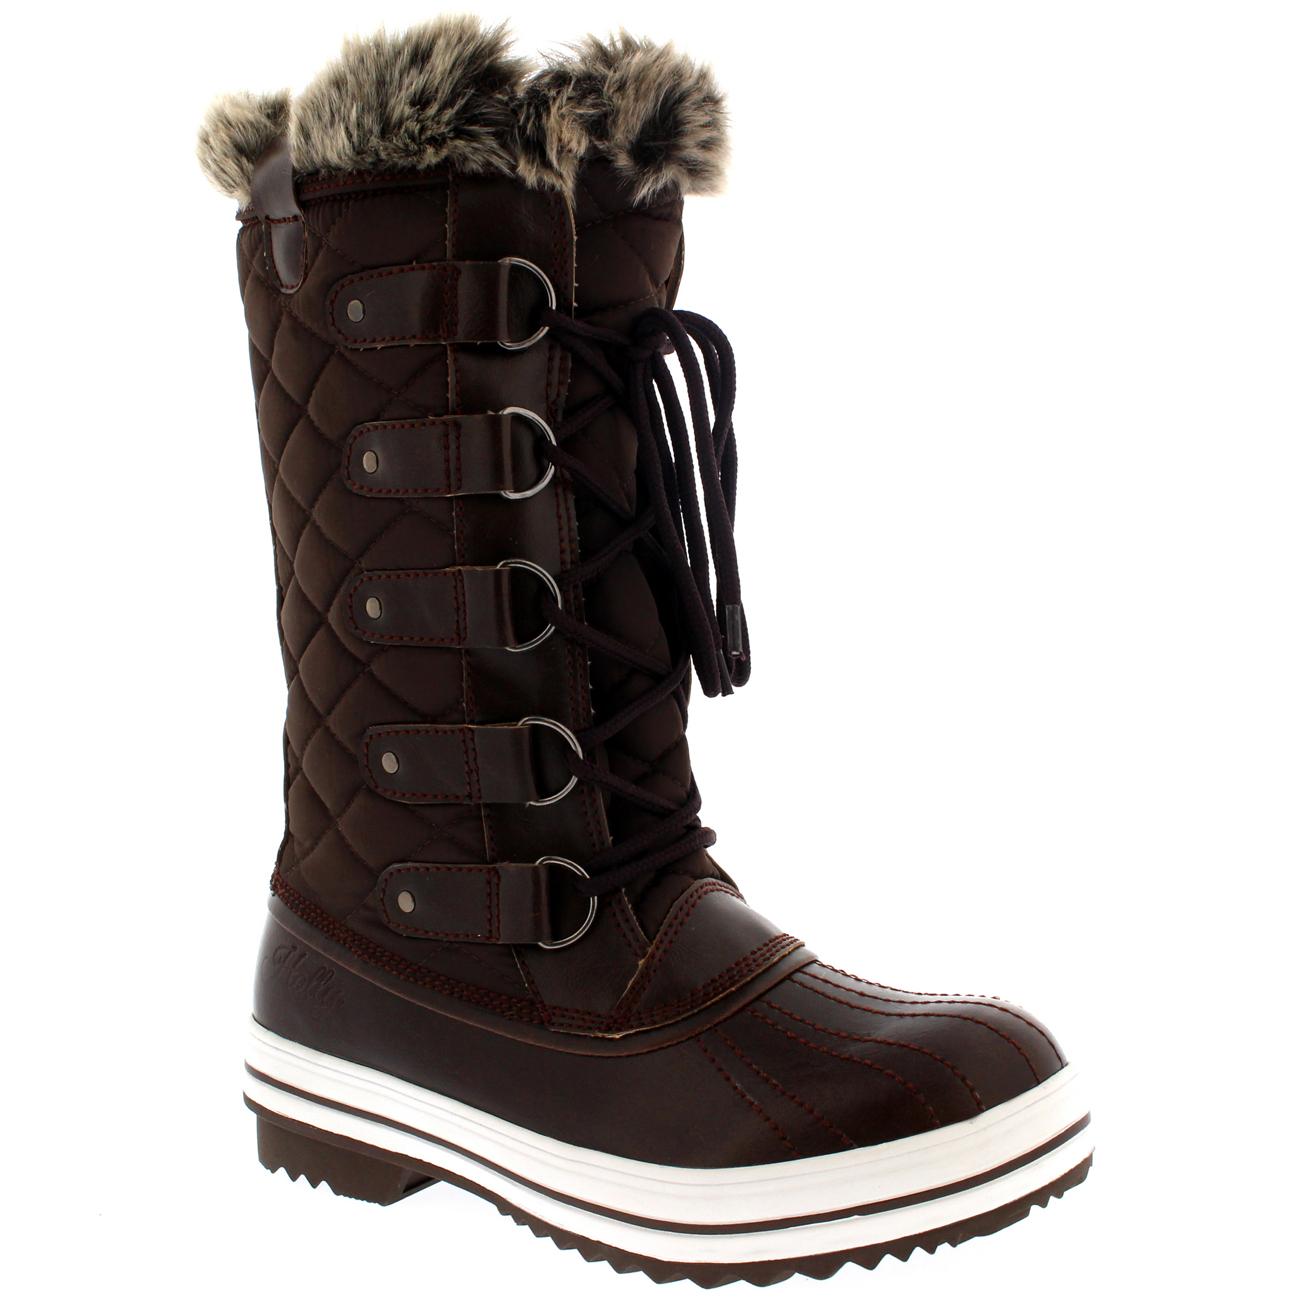 womens snow boot winter fur lined snow warm